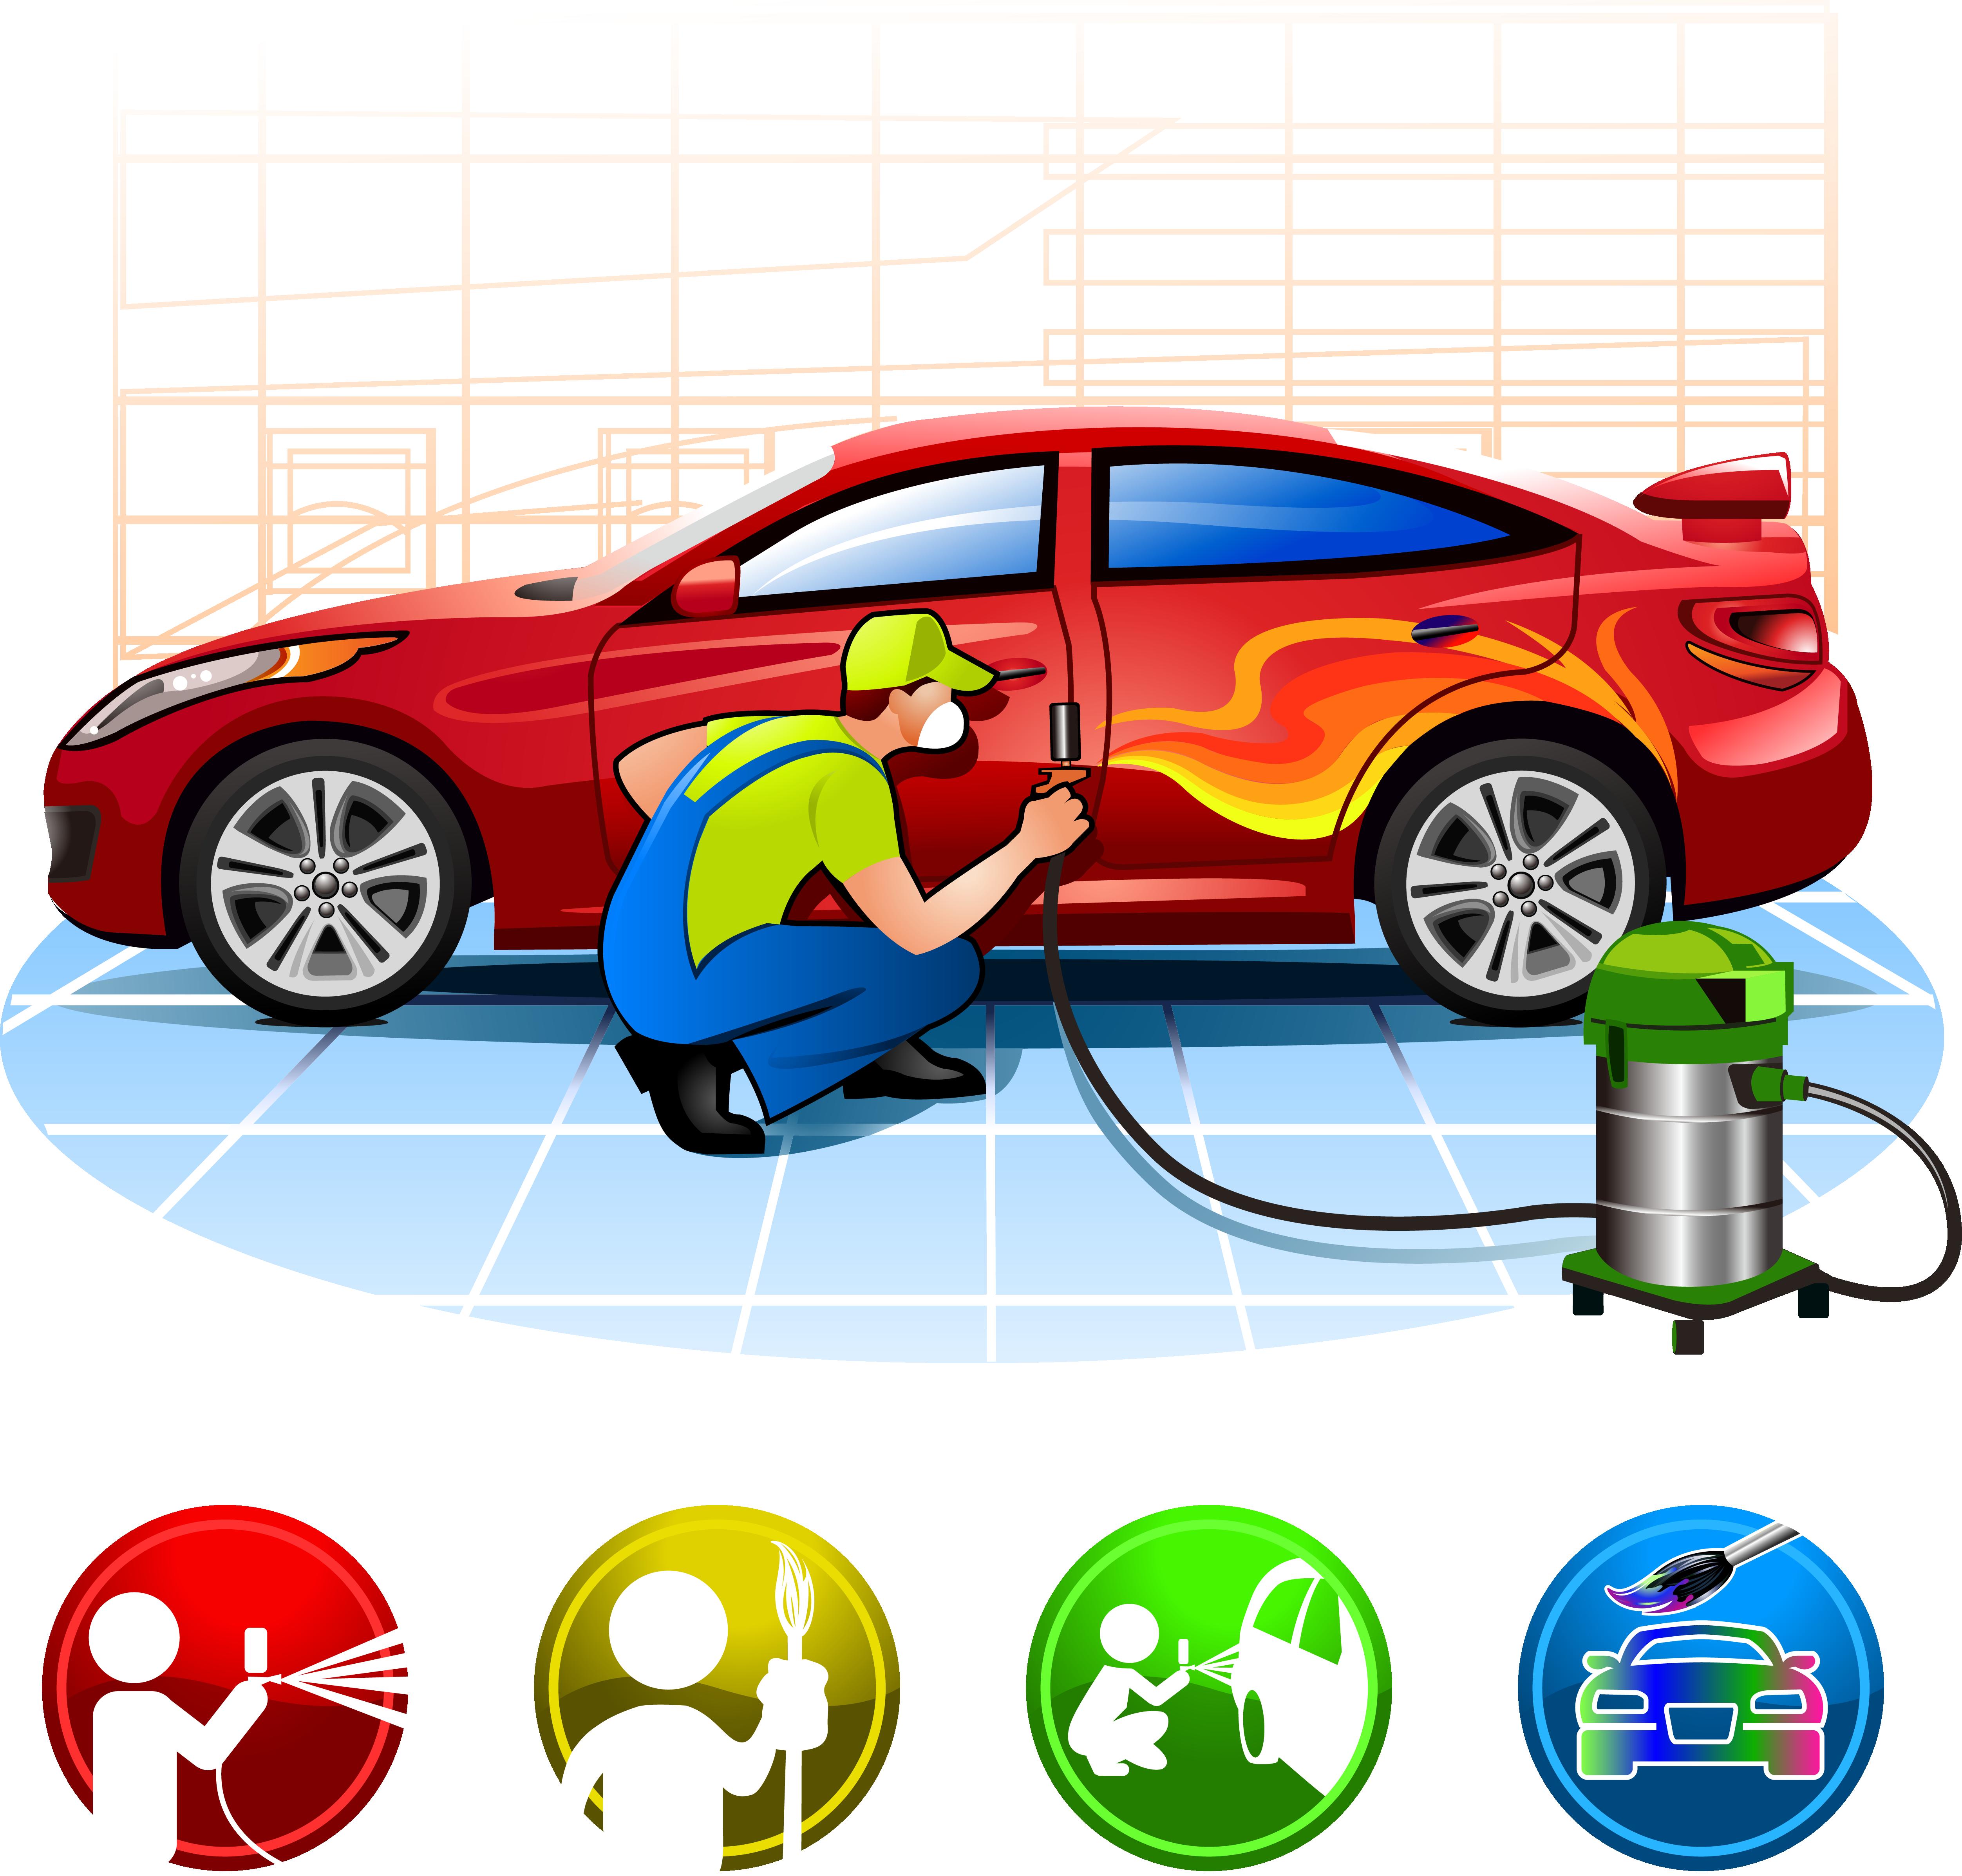 Car repair shop clipart jpg royalty free stock Car Automotive paint Automobile repair shop - Car waxing 5009*4789 ... jpg royalty free stock